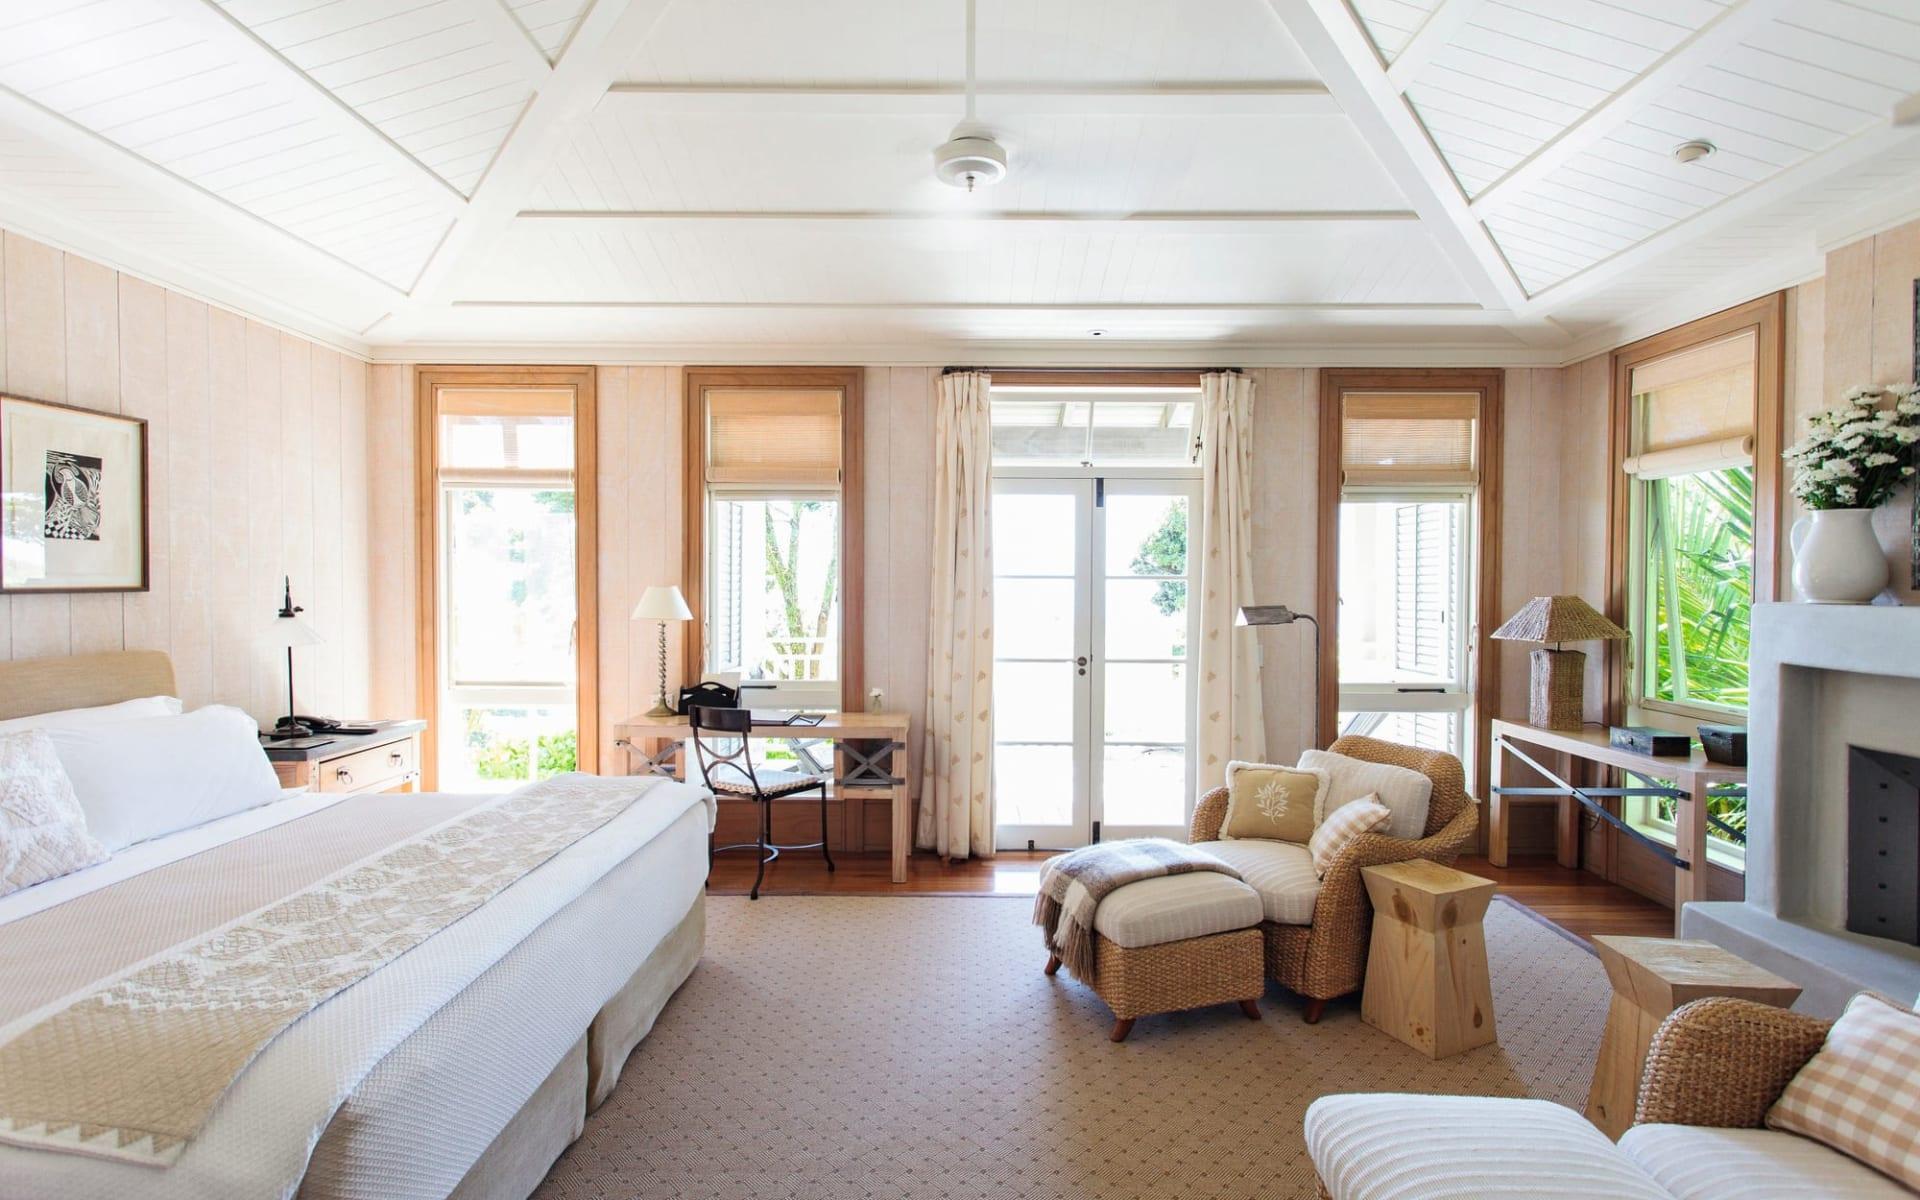 The Lodge at Kauri Cliffs in Matauri Bay:  The Lodge at Kauri Cliffs - Suite